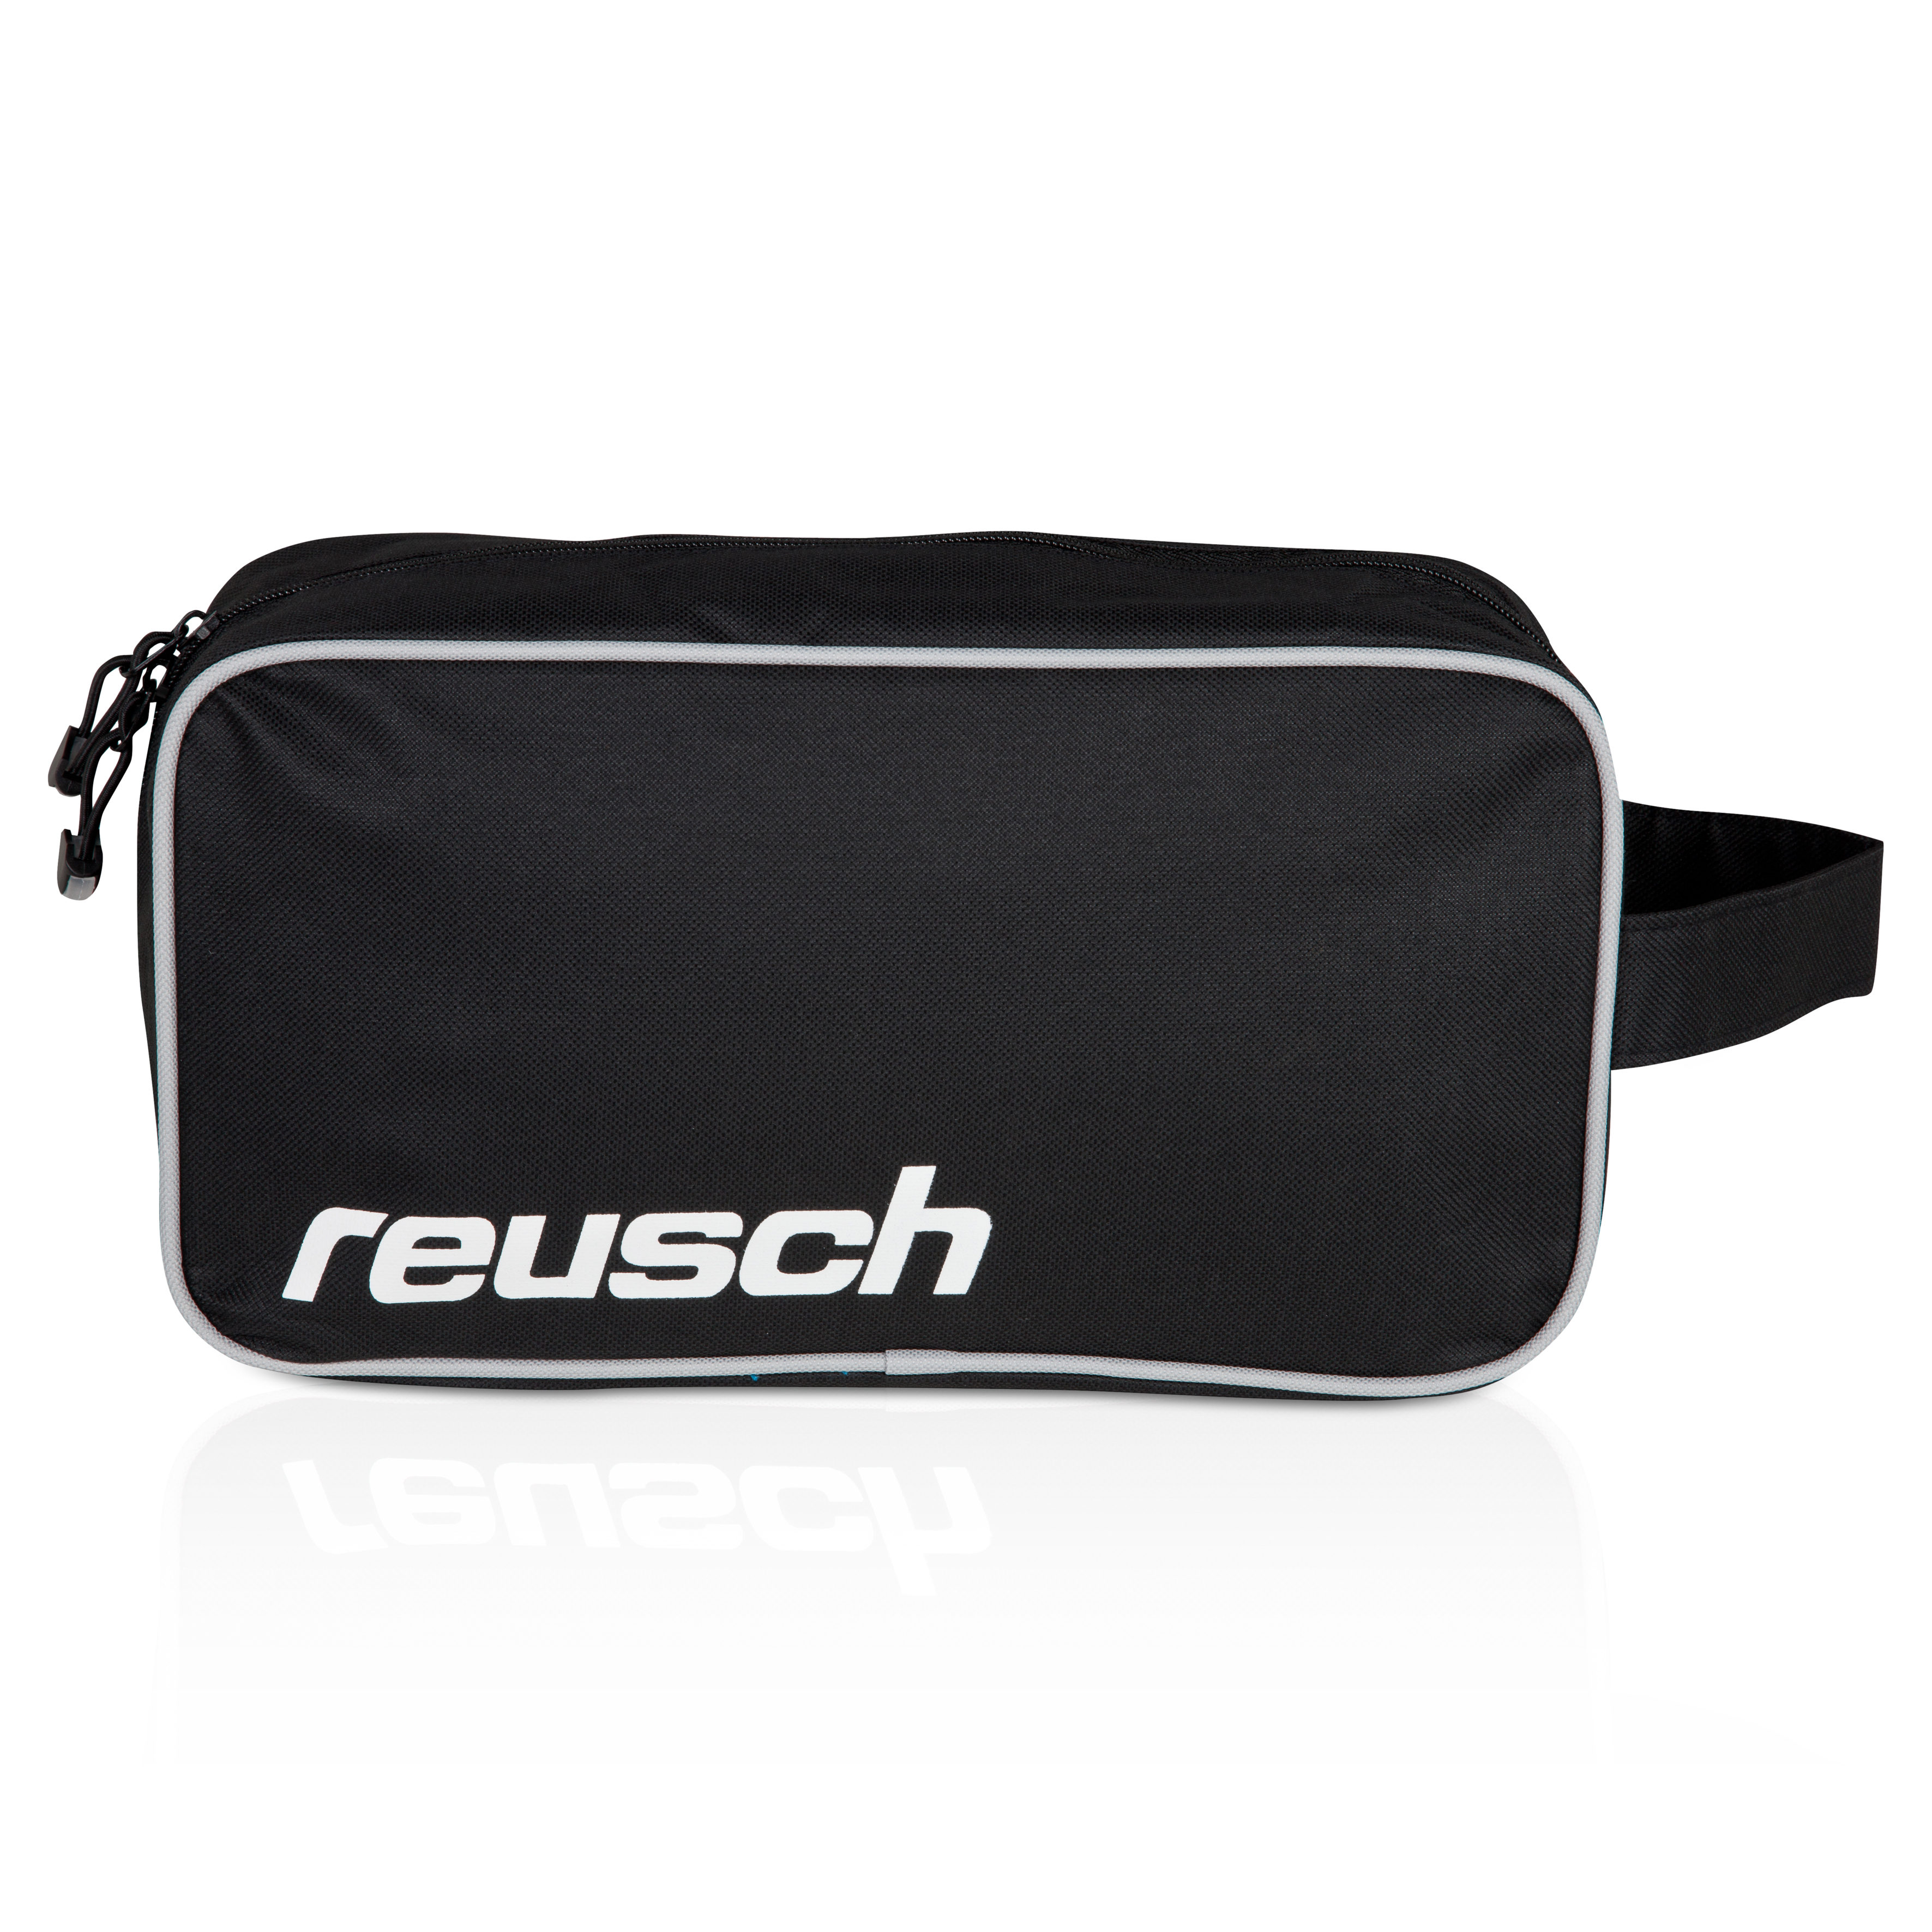 Reusch Portero Goalkeeper Glove Bag-Black